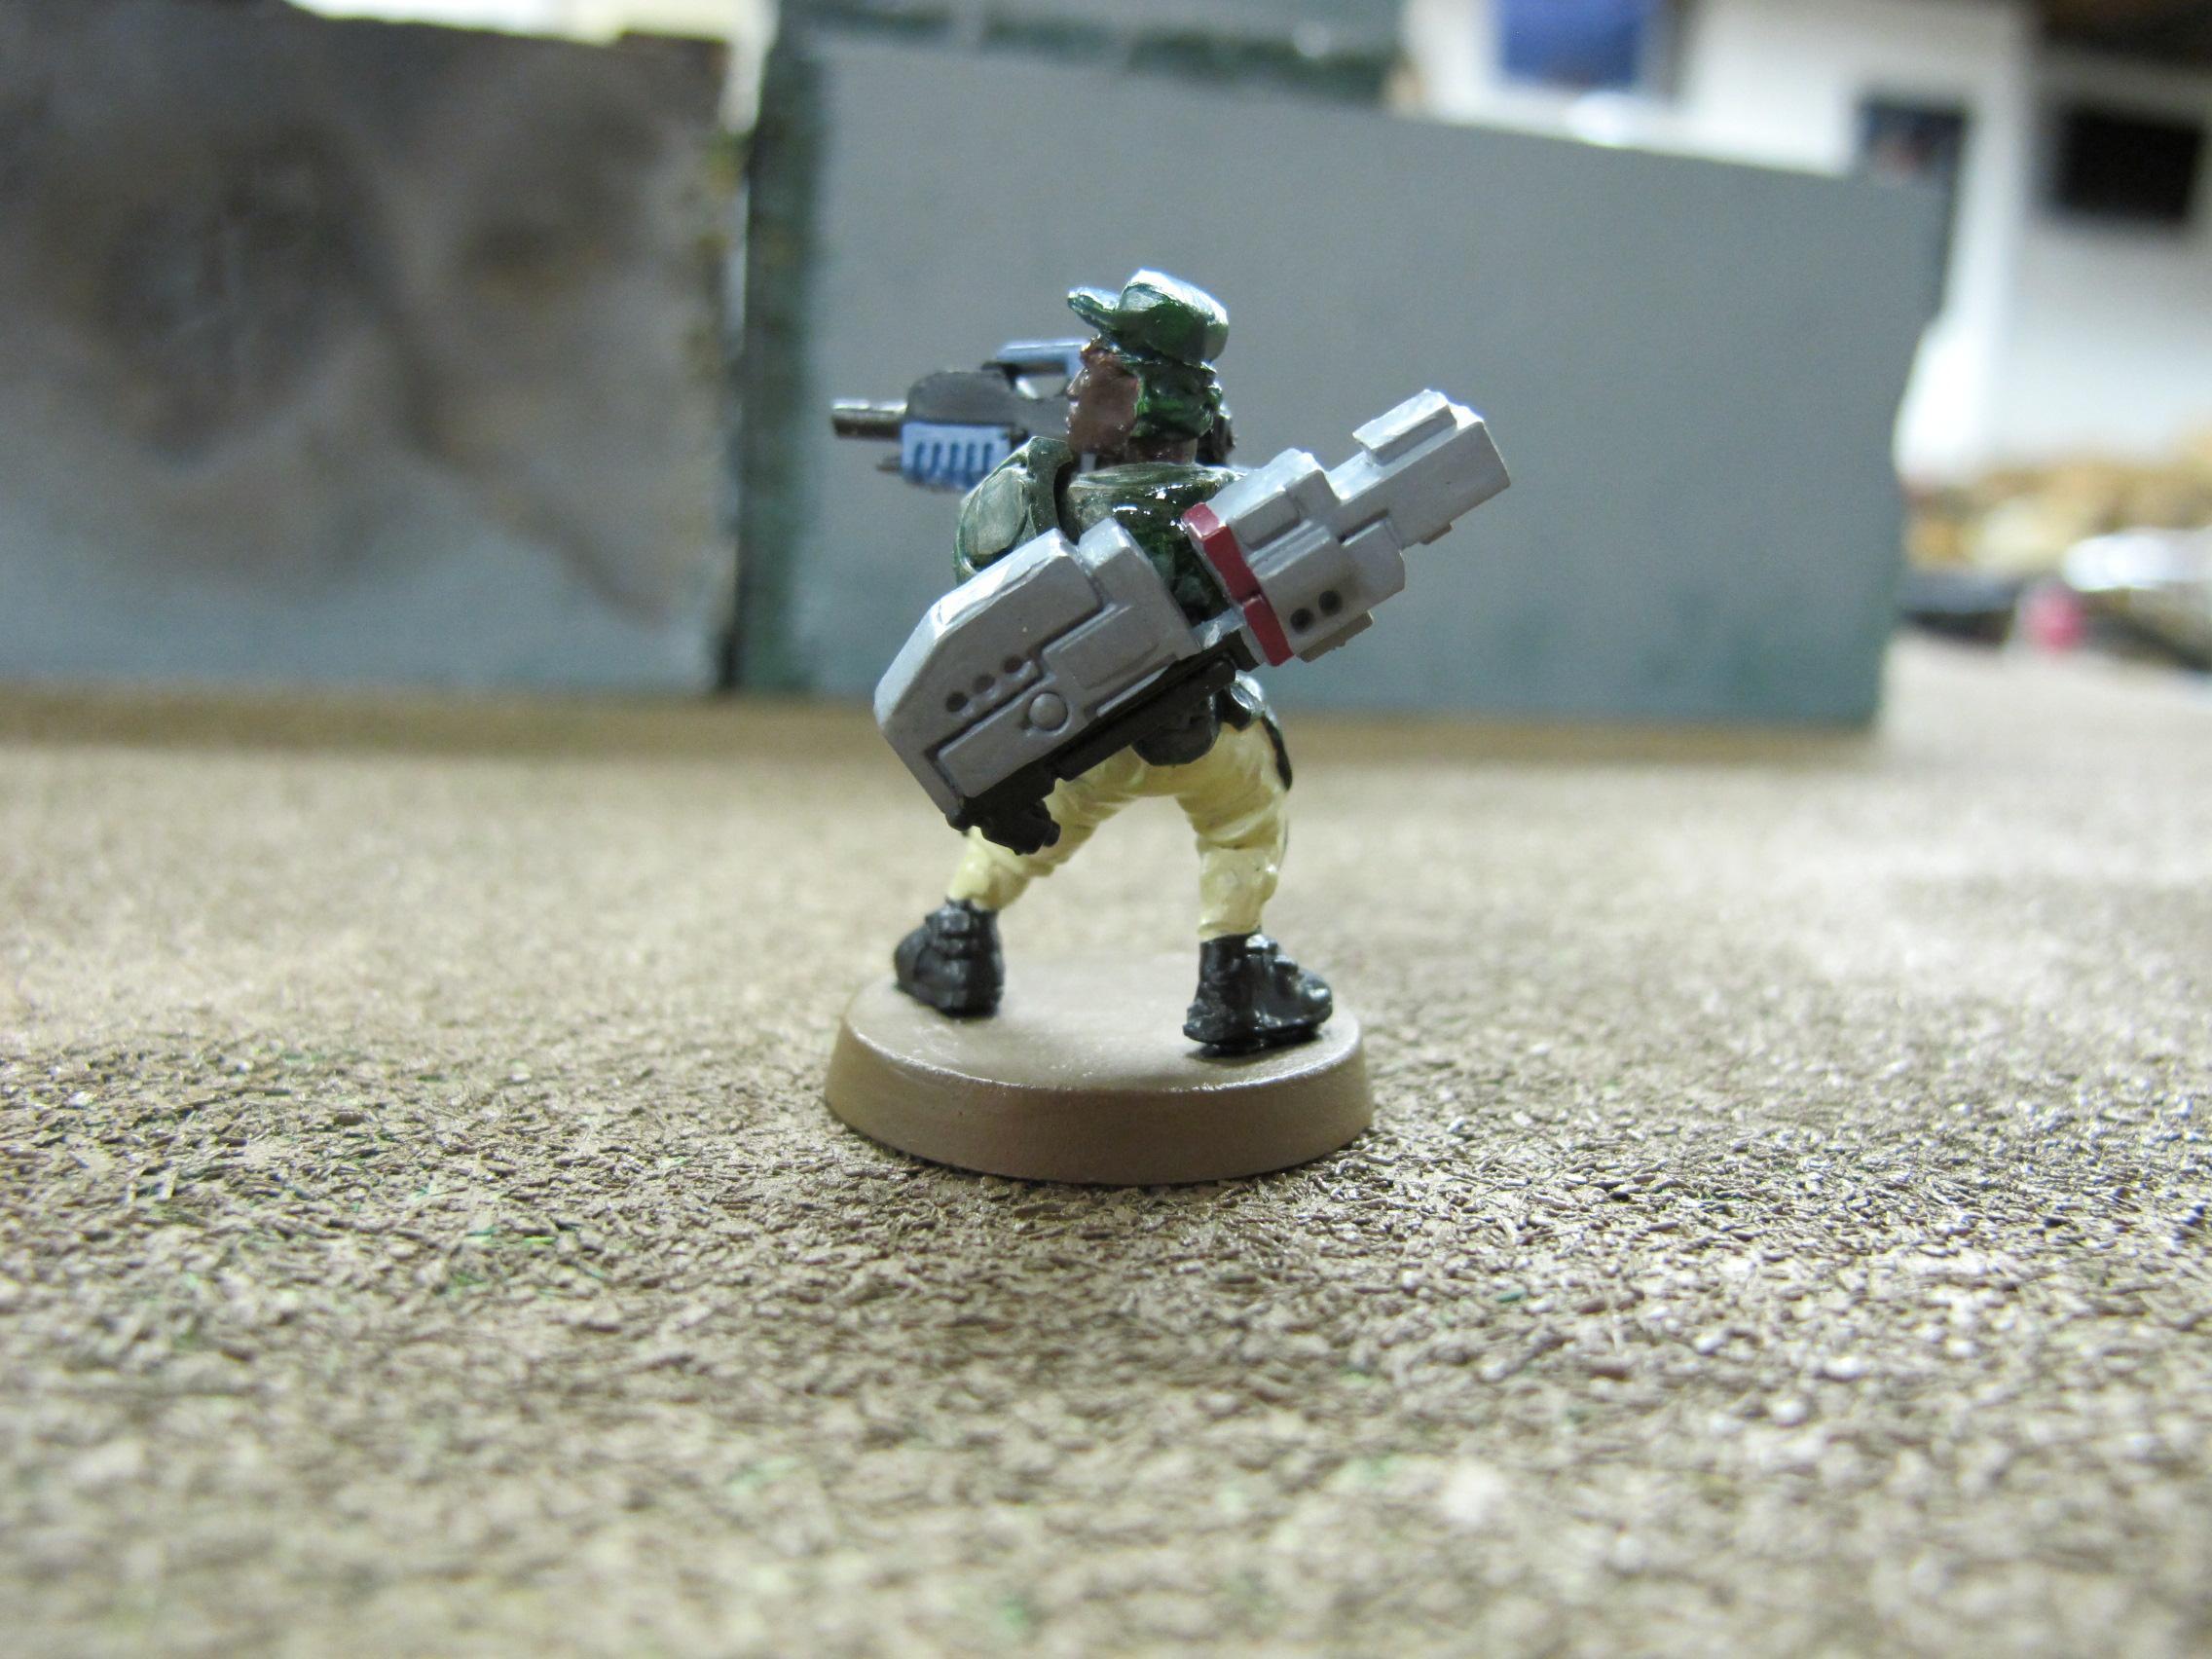 Avery Johnson, Halo, Spartan Laser, Videogame